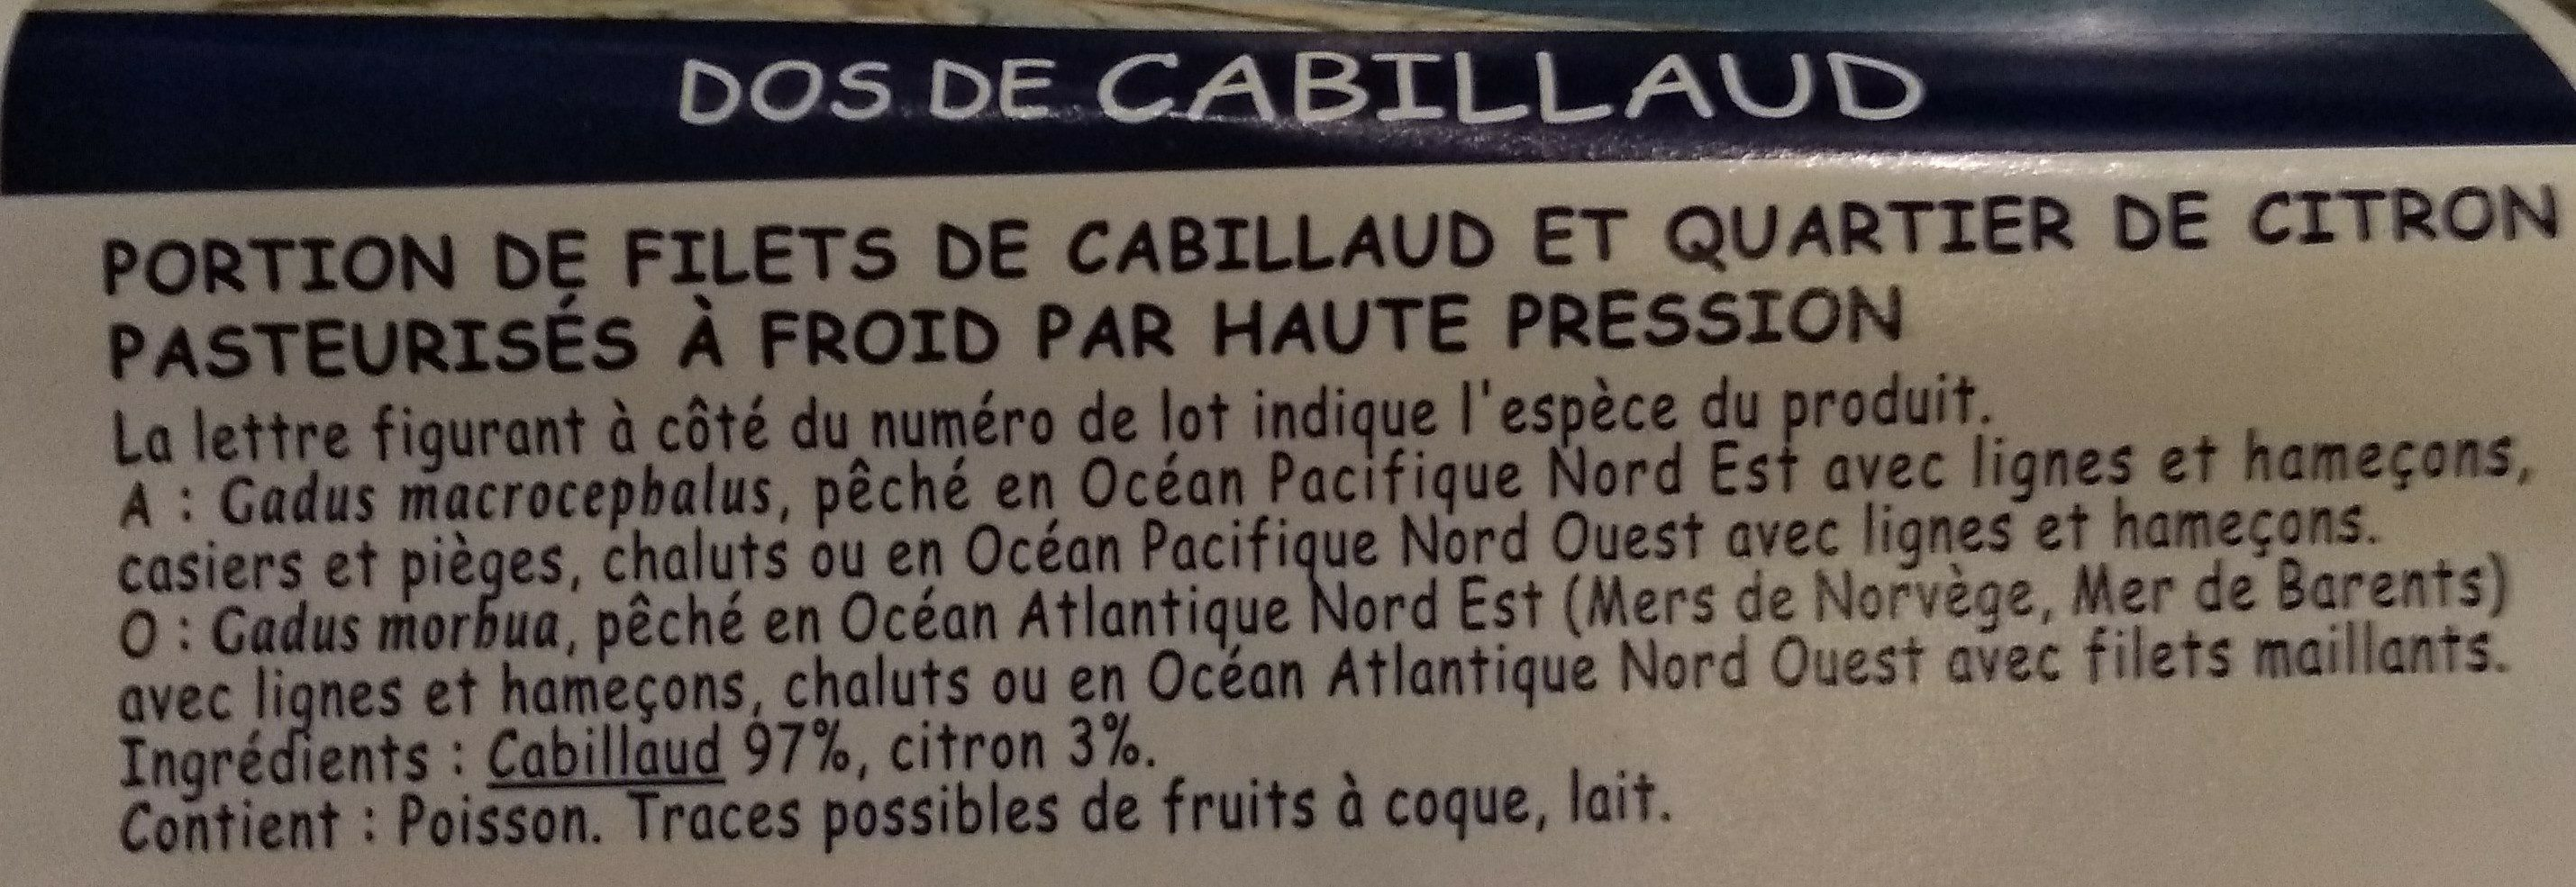 Dos de Cabillaud - Ingrediënten - fr